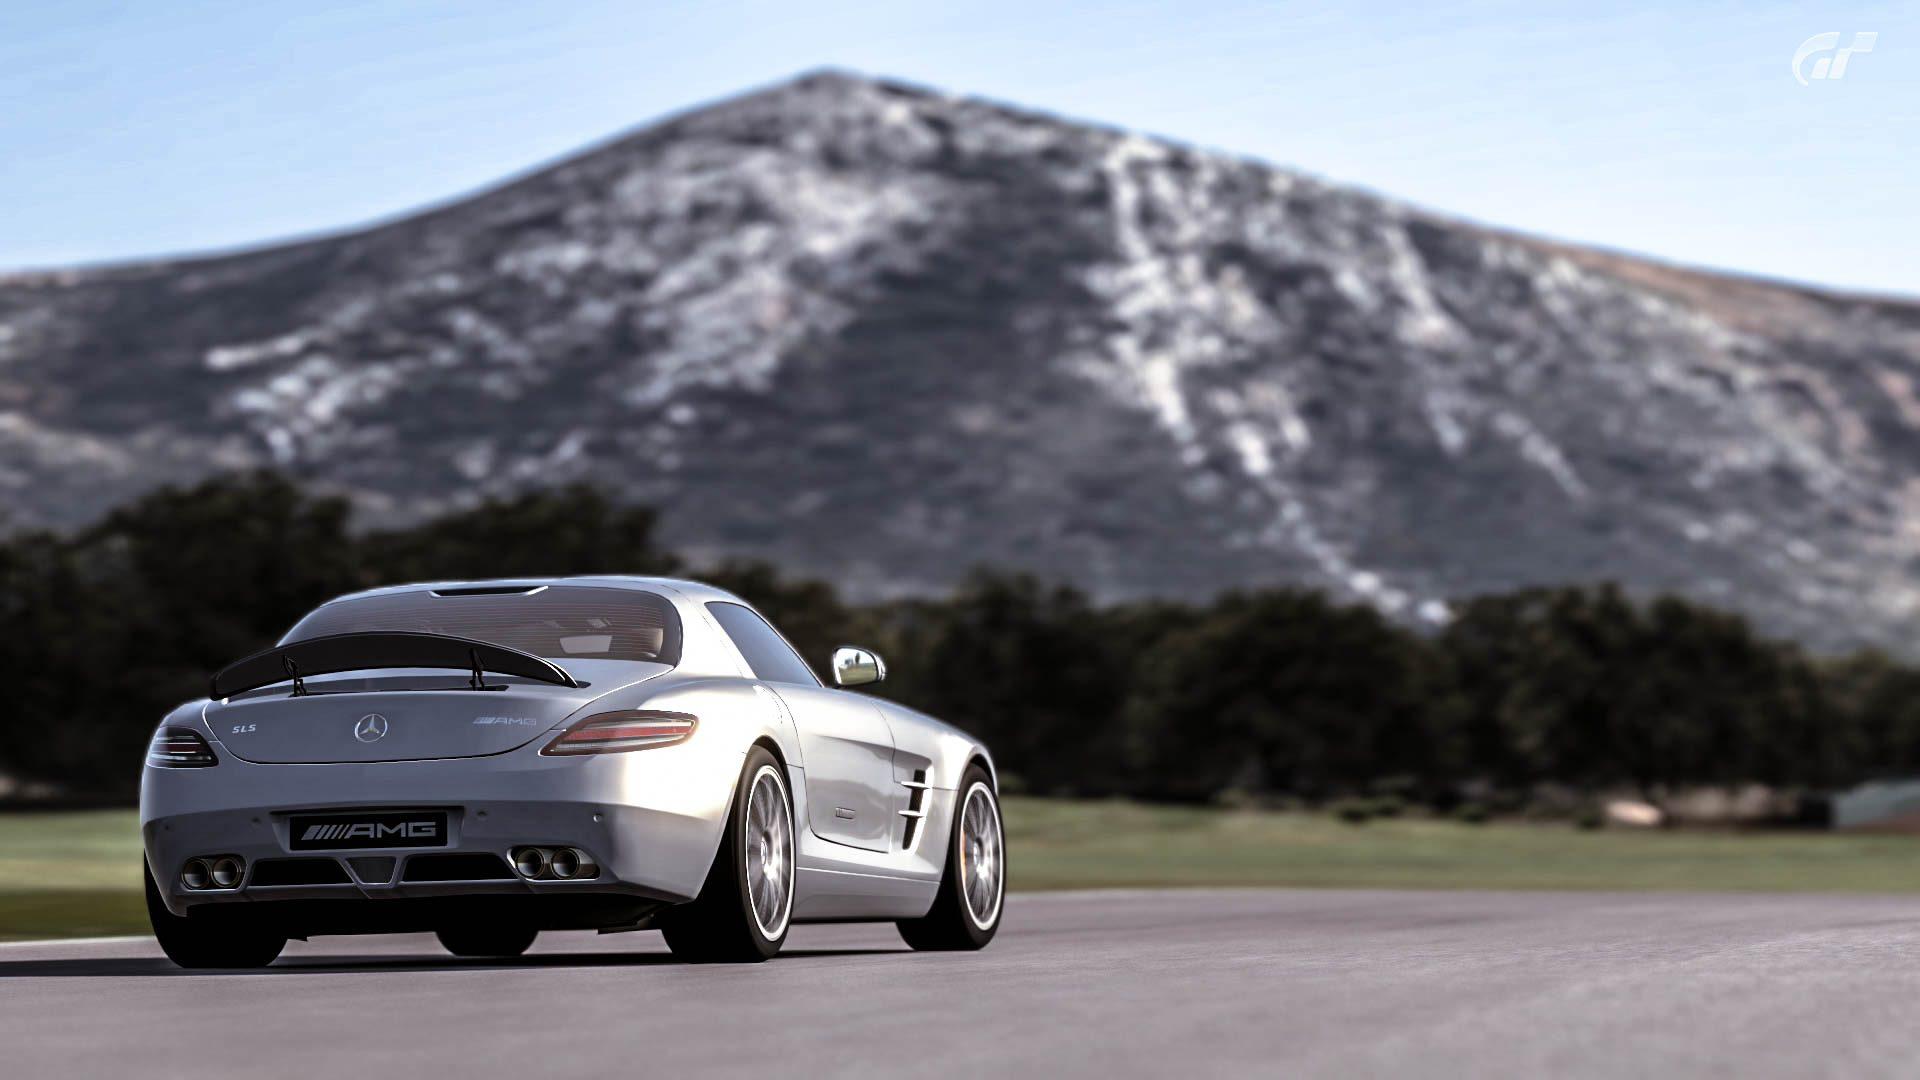 Mercedes_SLS_AMG_07.jpg